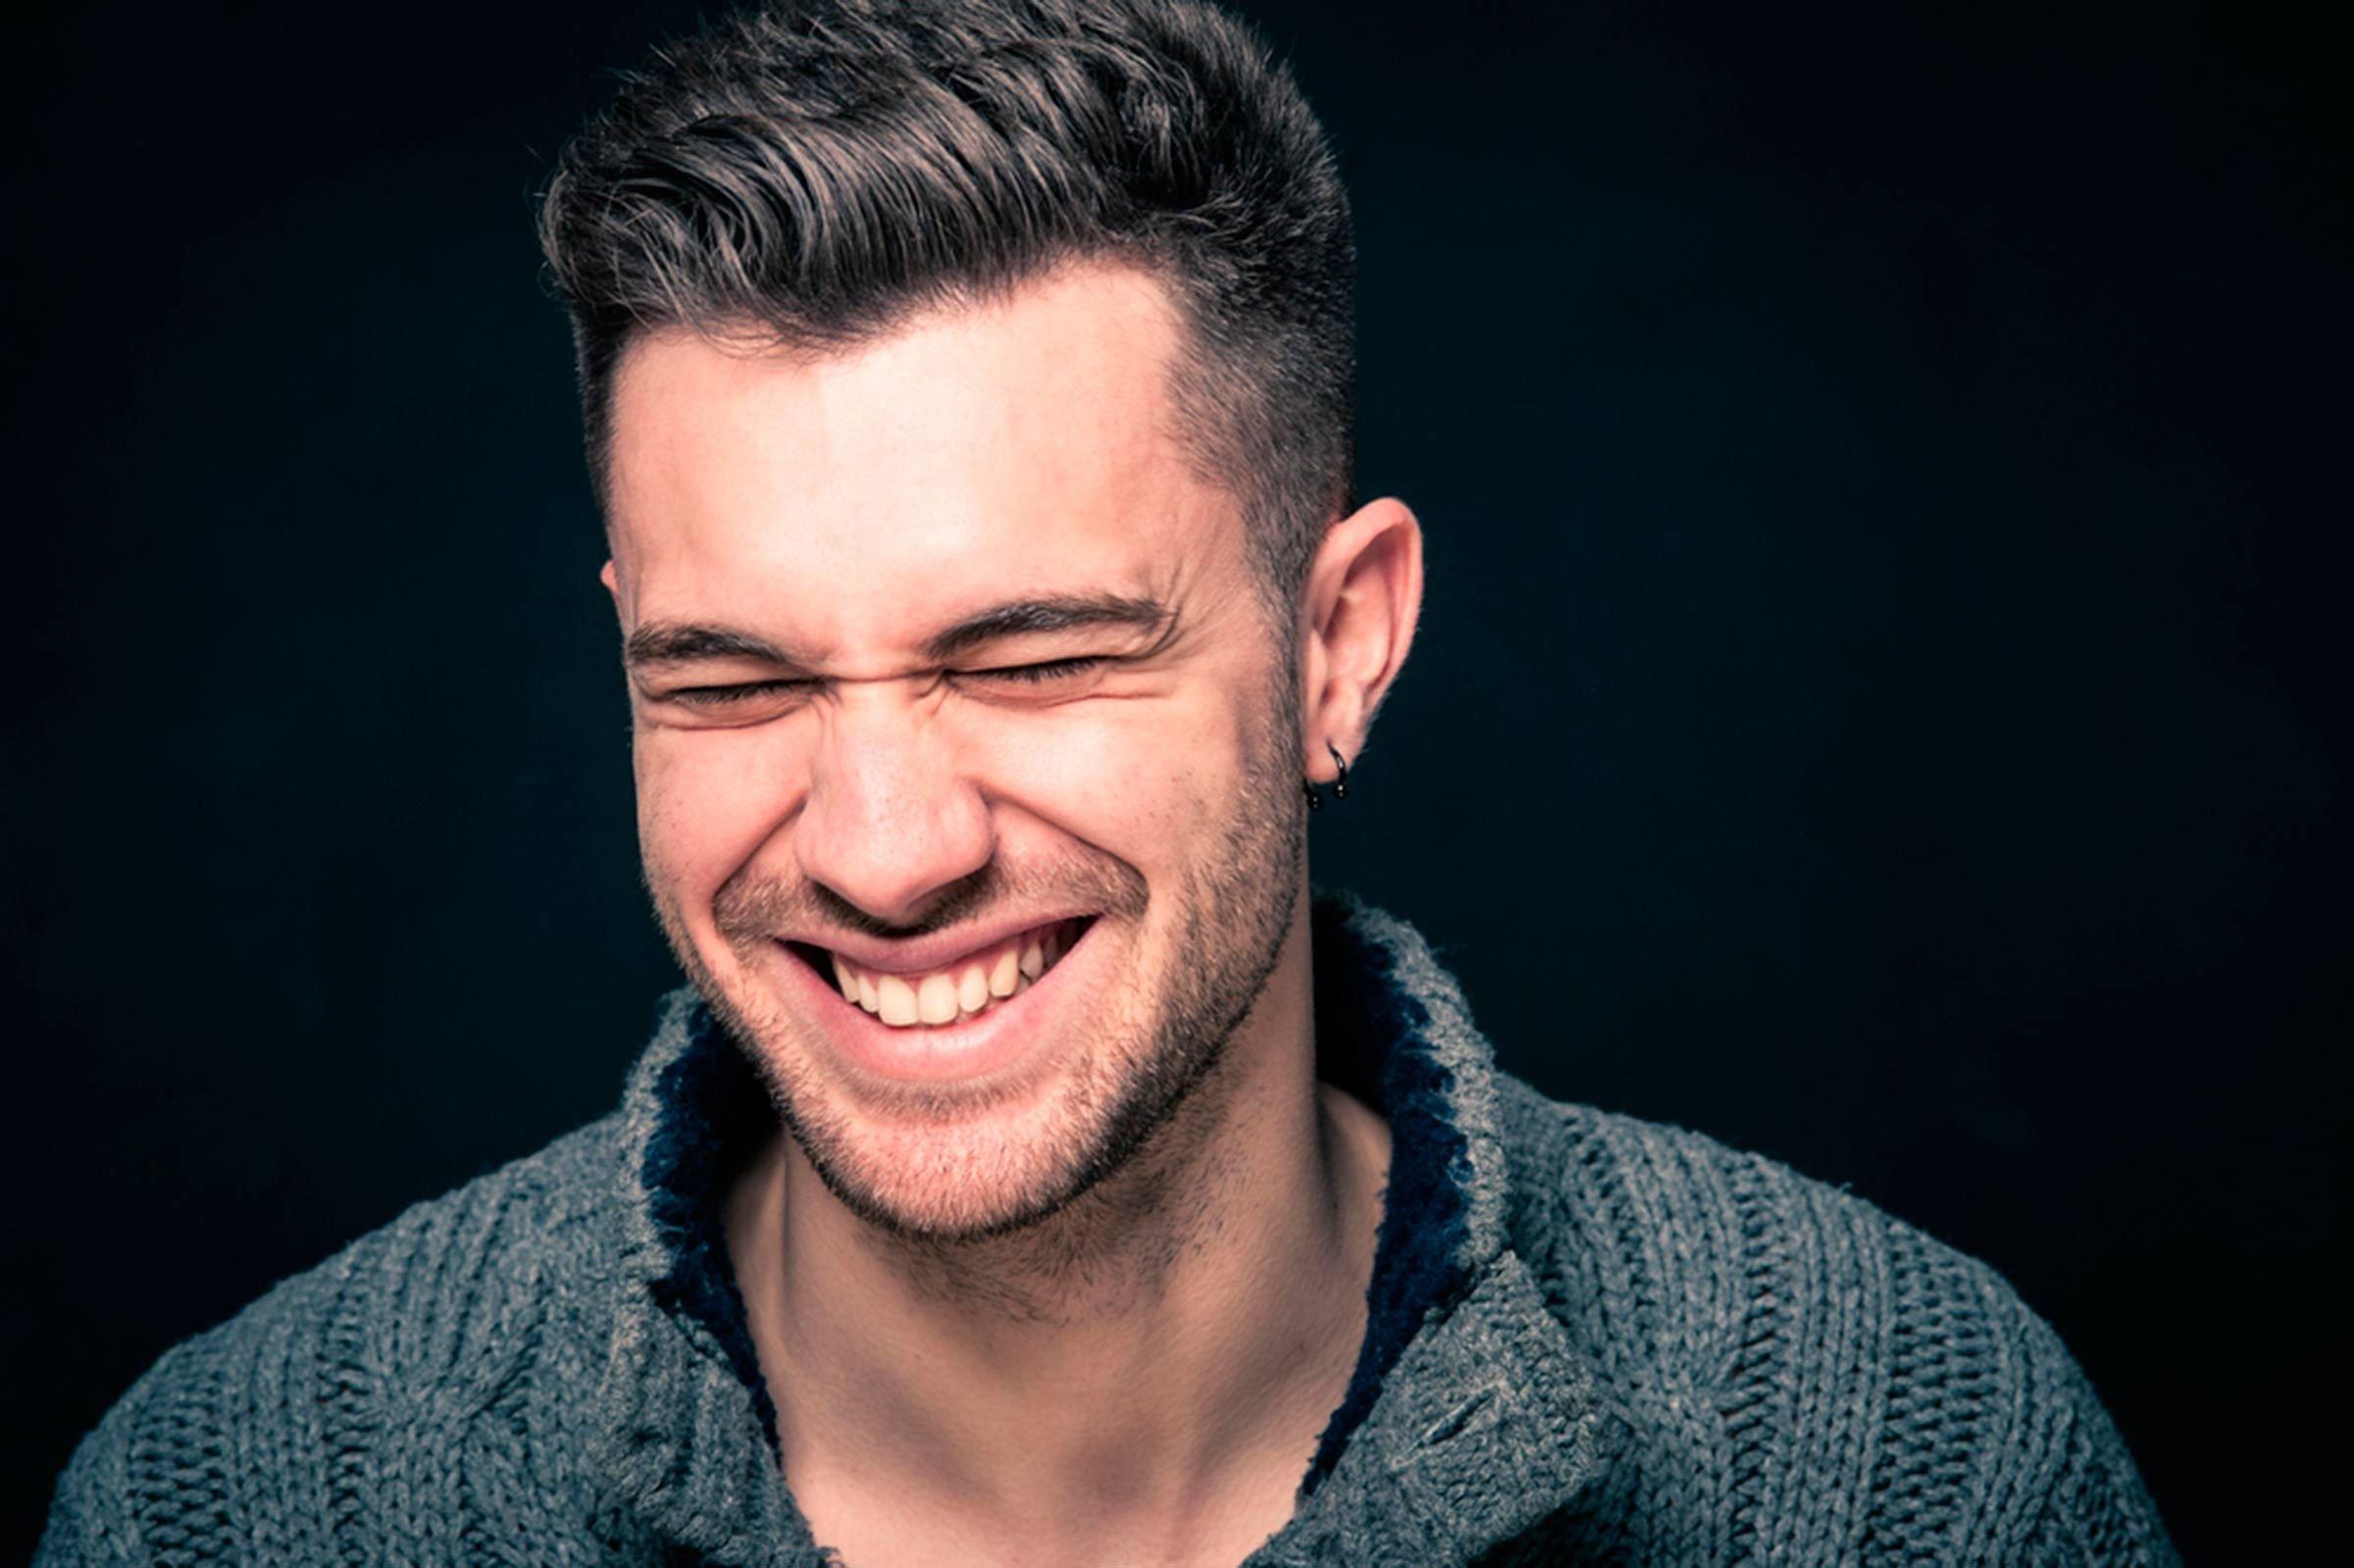 Smart People Have a Dark Sense of Humor | Reader's Digest